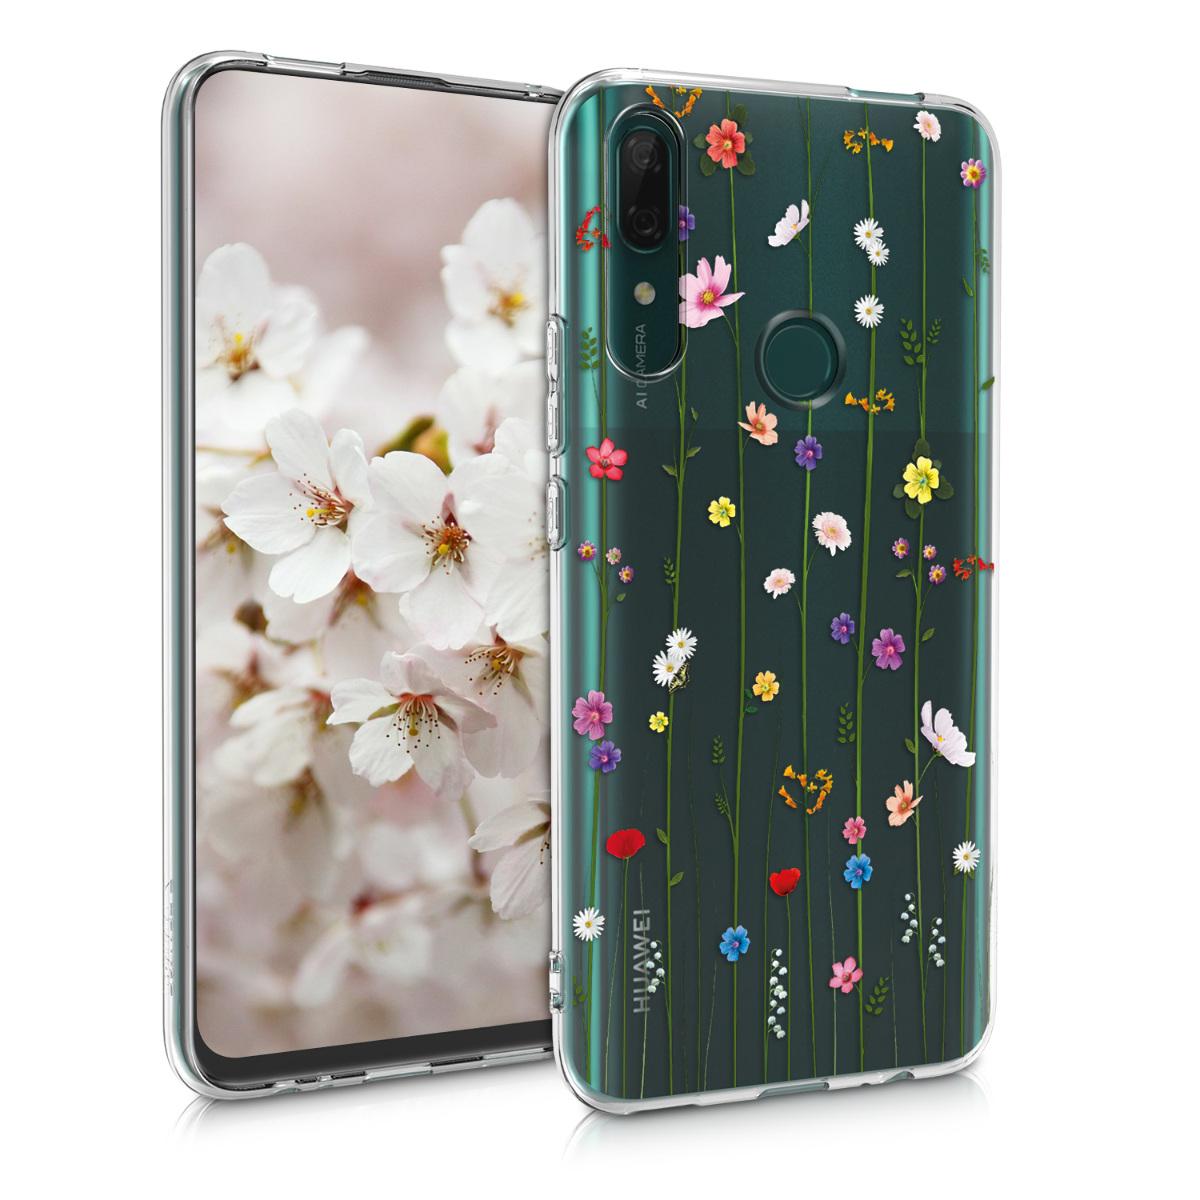 KW Θήκη Σιλικόνης Huawei P Smart Z - Multicolor / Transparent (50359.04)